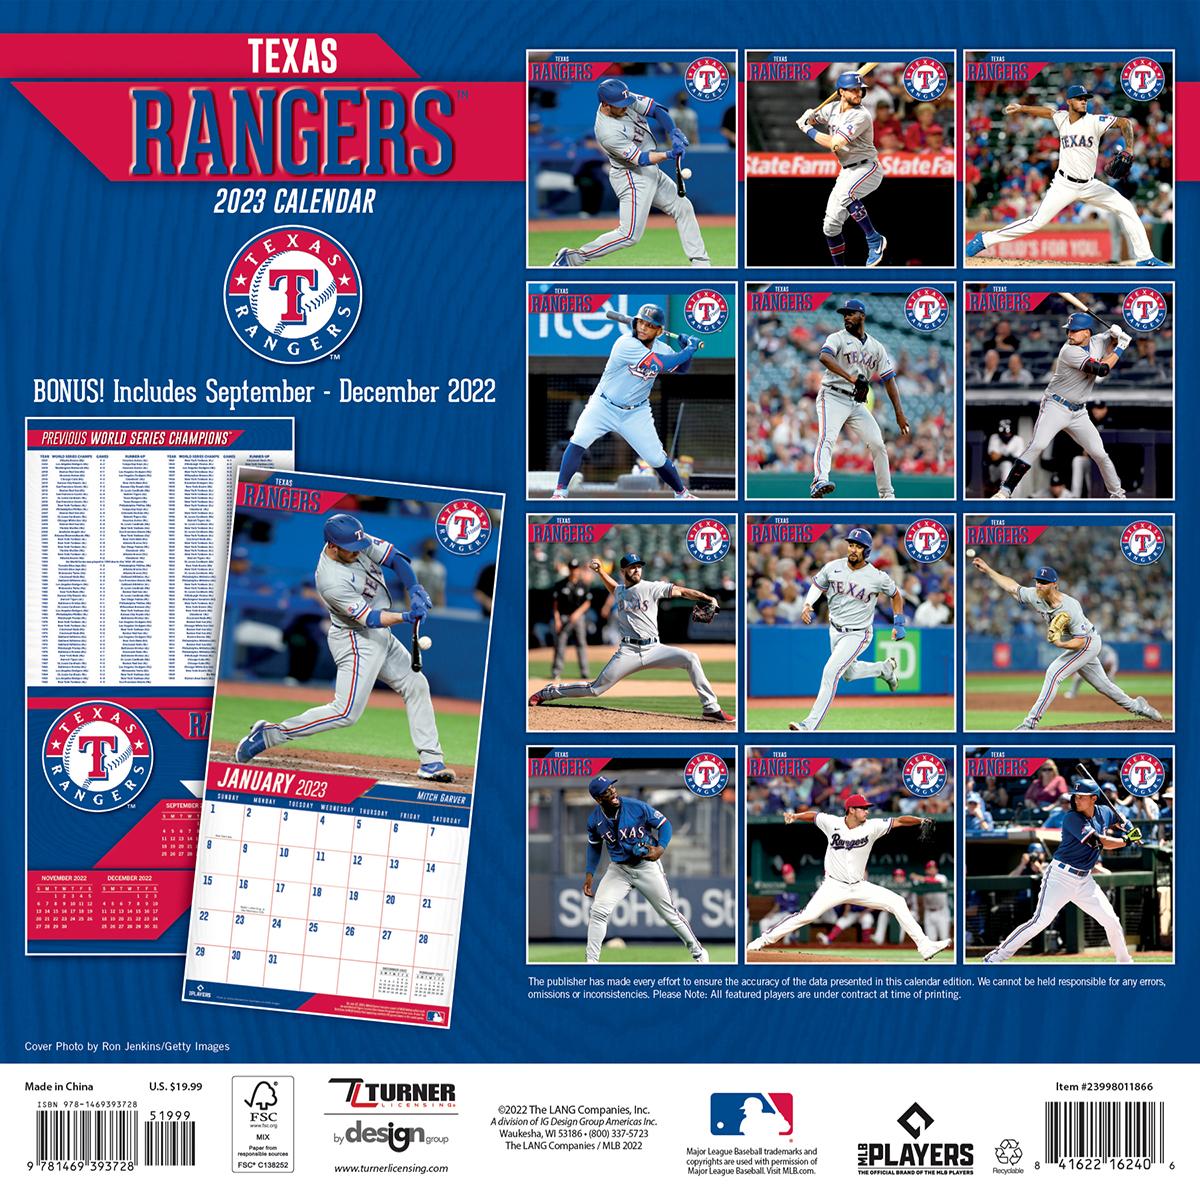 Texas Rangers 2018 Wall Calendar Buy At Khc Sports